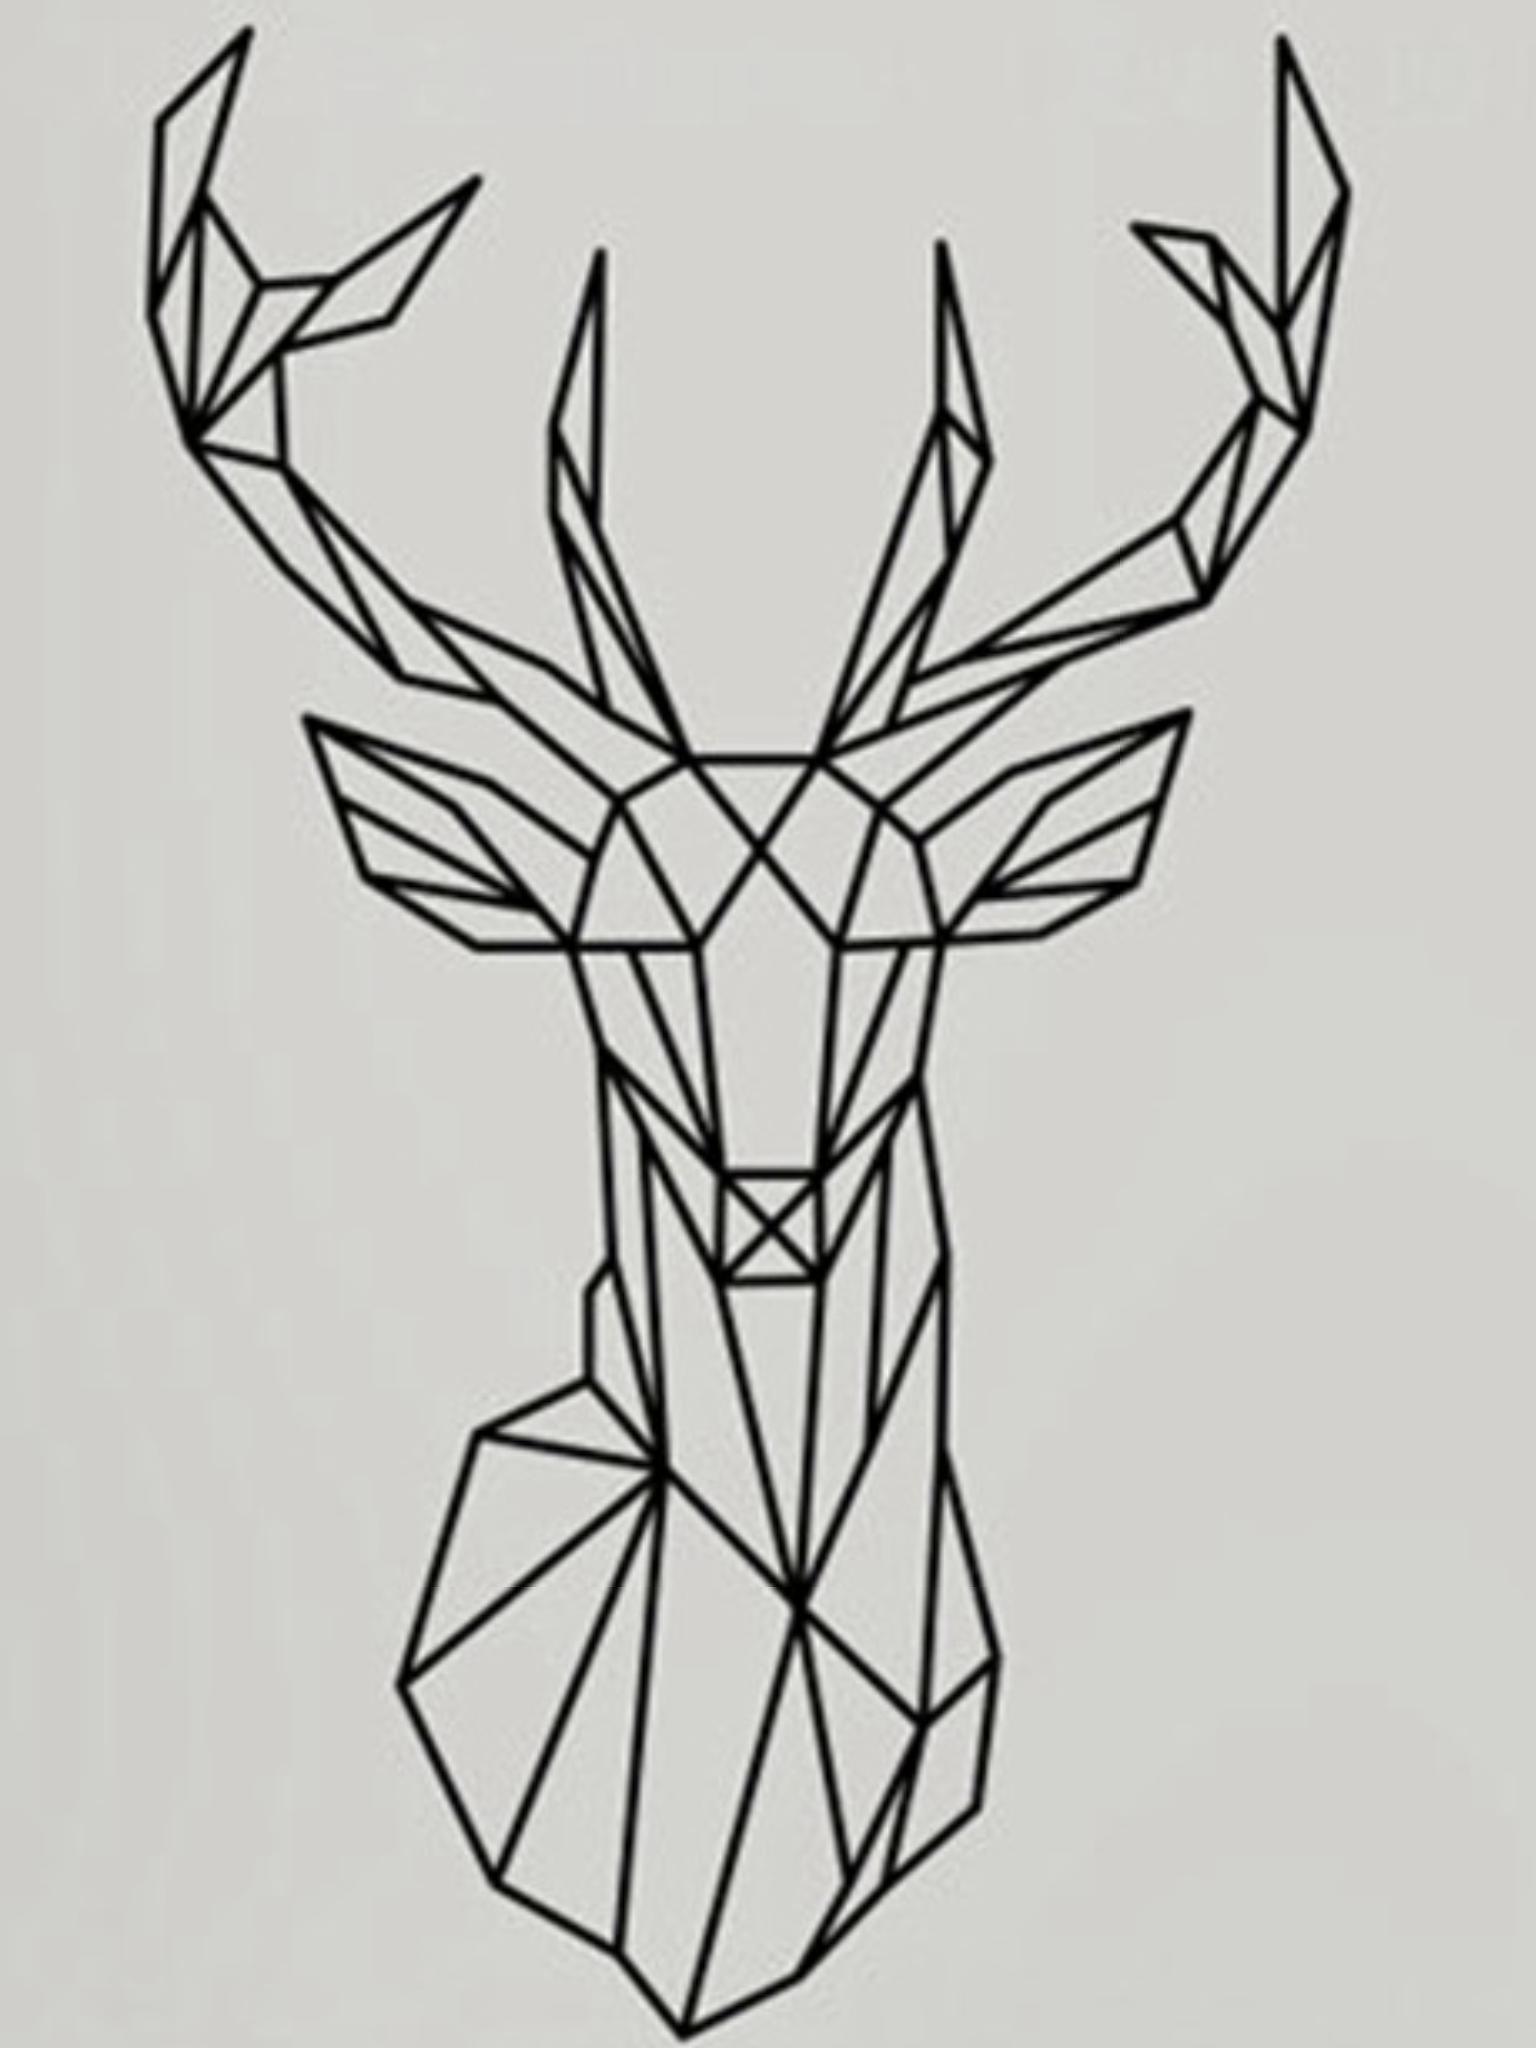 Pin de Zanne en Draw doodles Pinterest Geometrisches